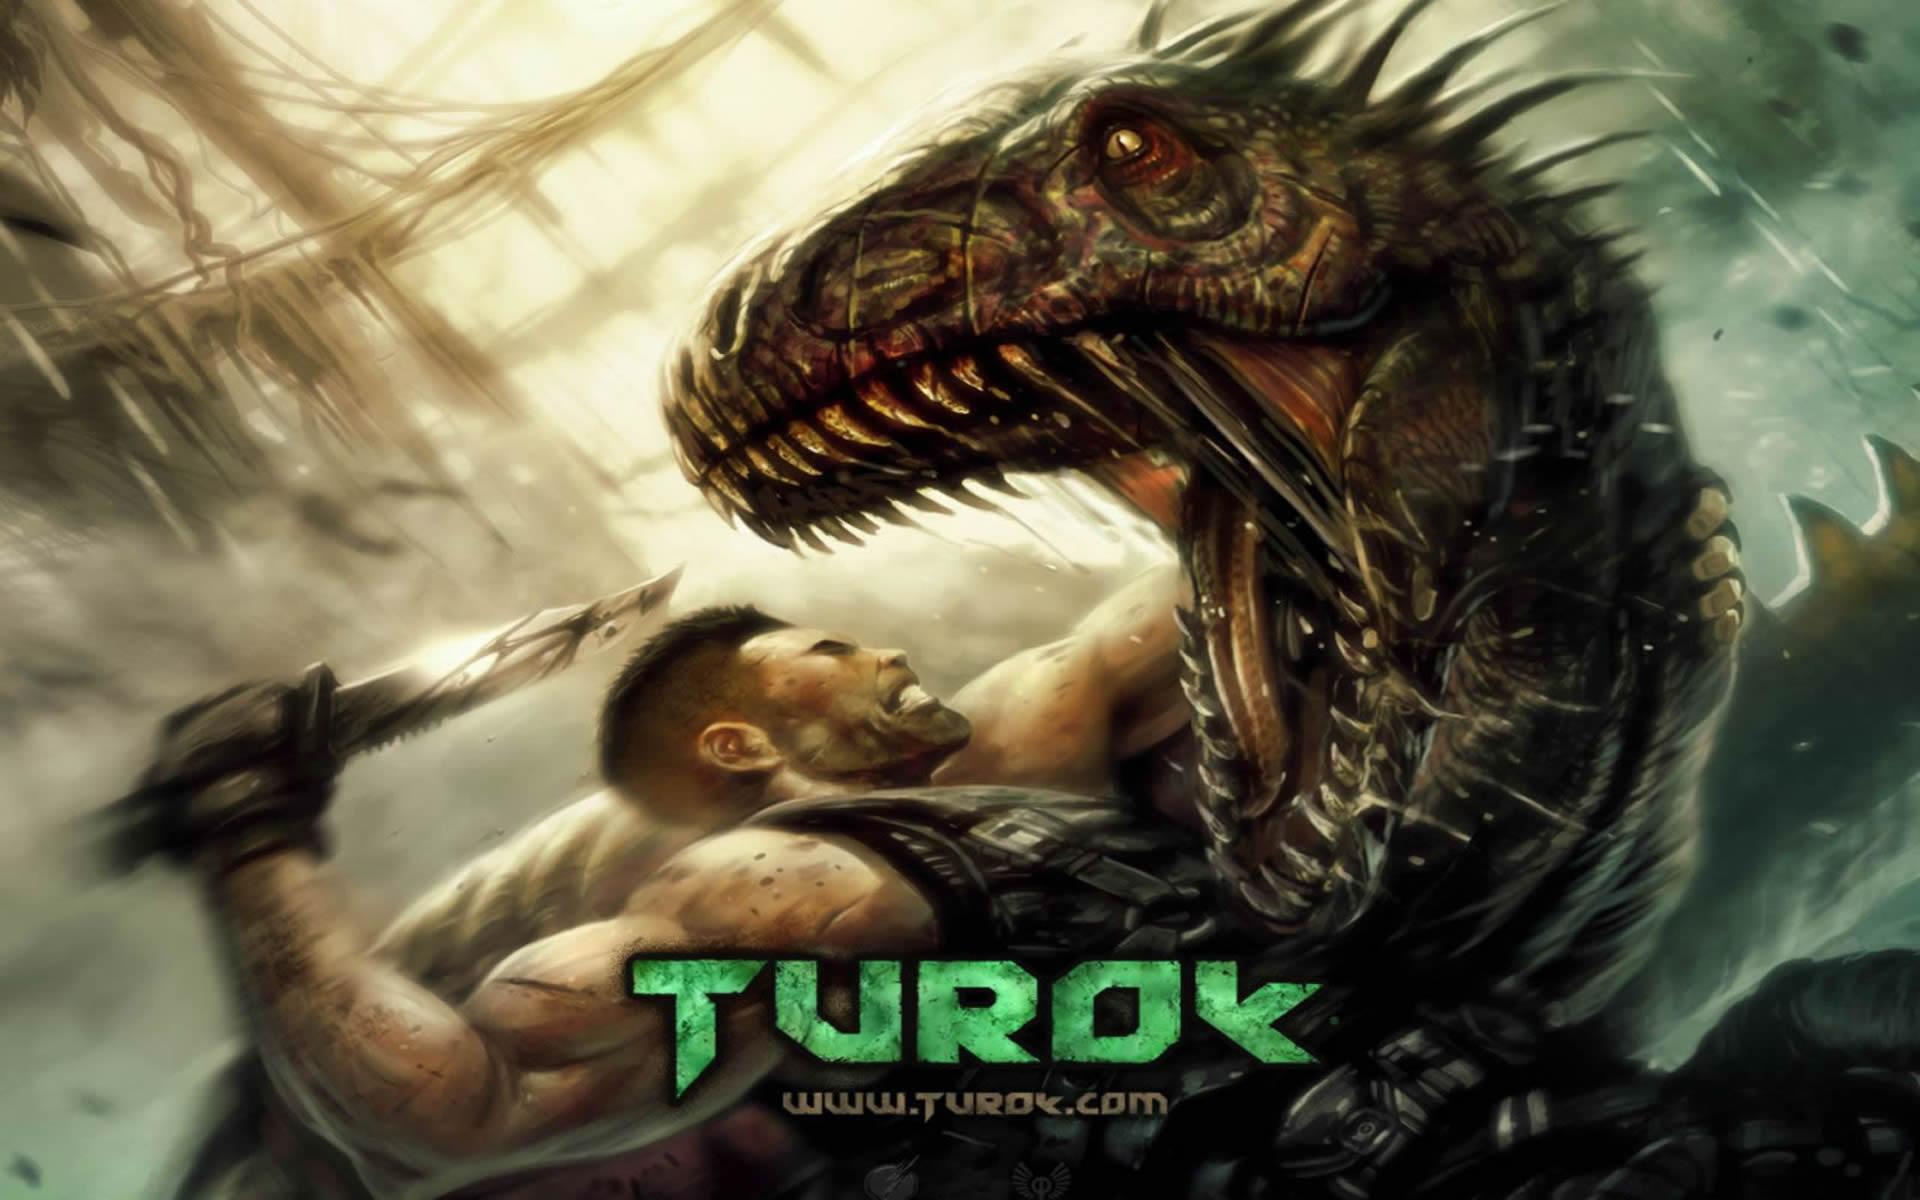 Turok Attacking Dinosaur With Knife